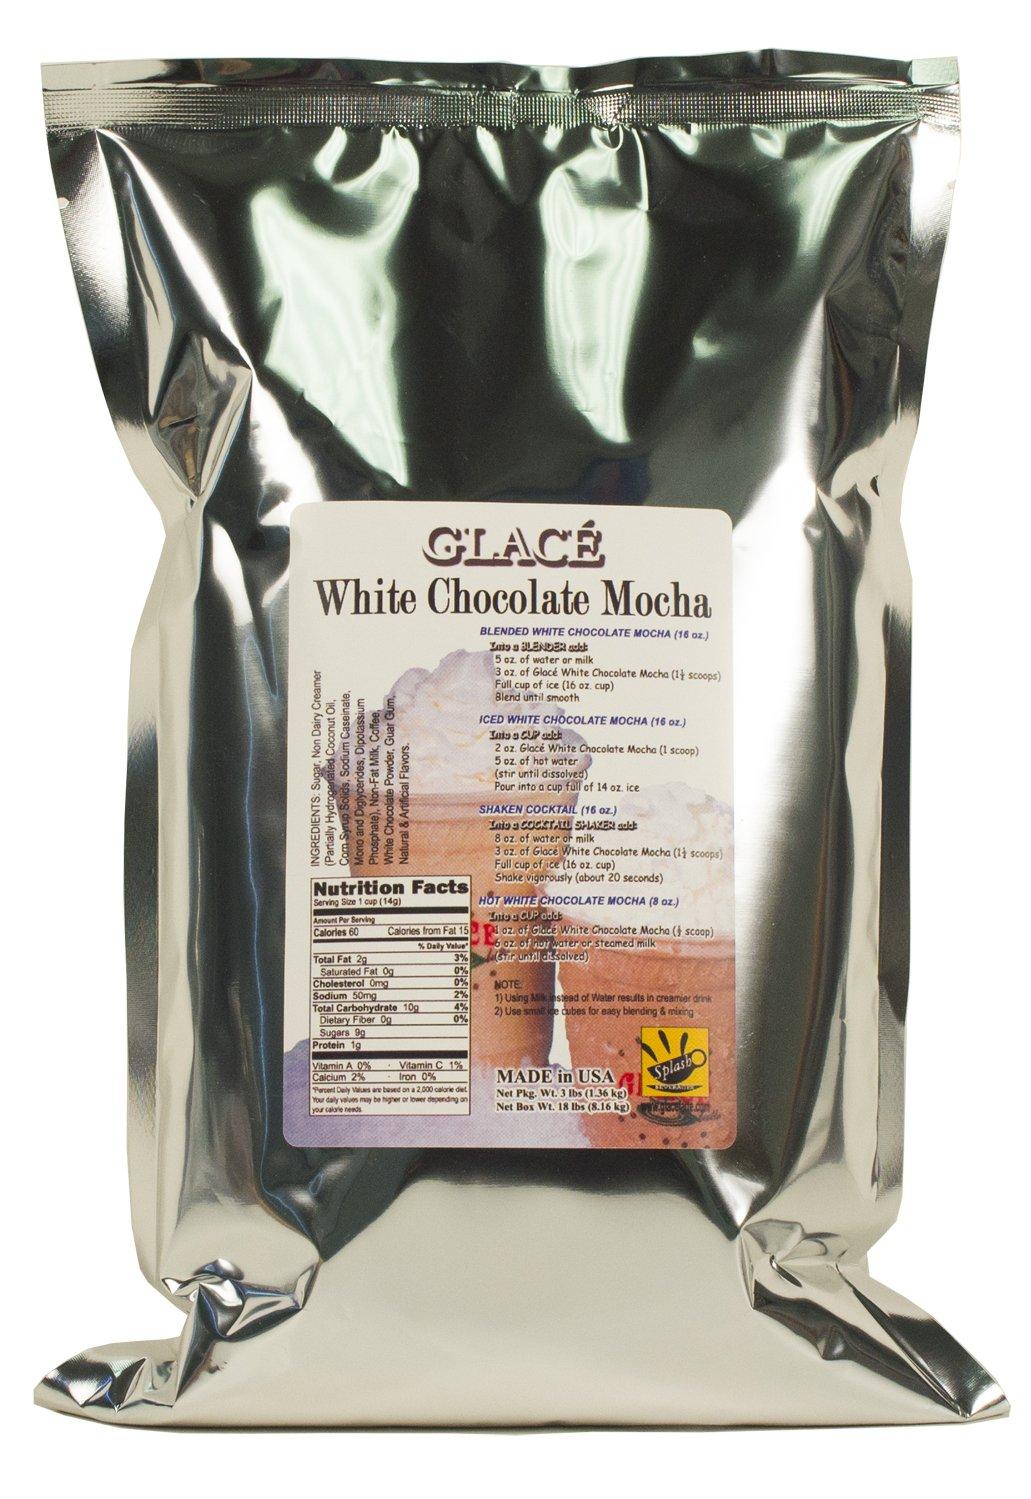 Glace White Chocolate Mocha (3-lb pack)